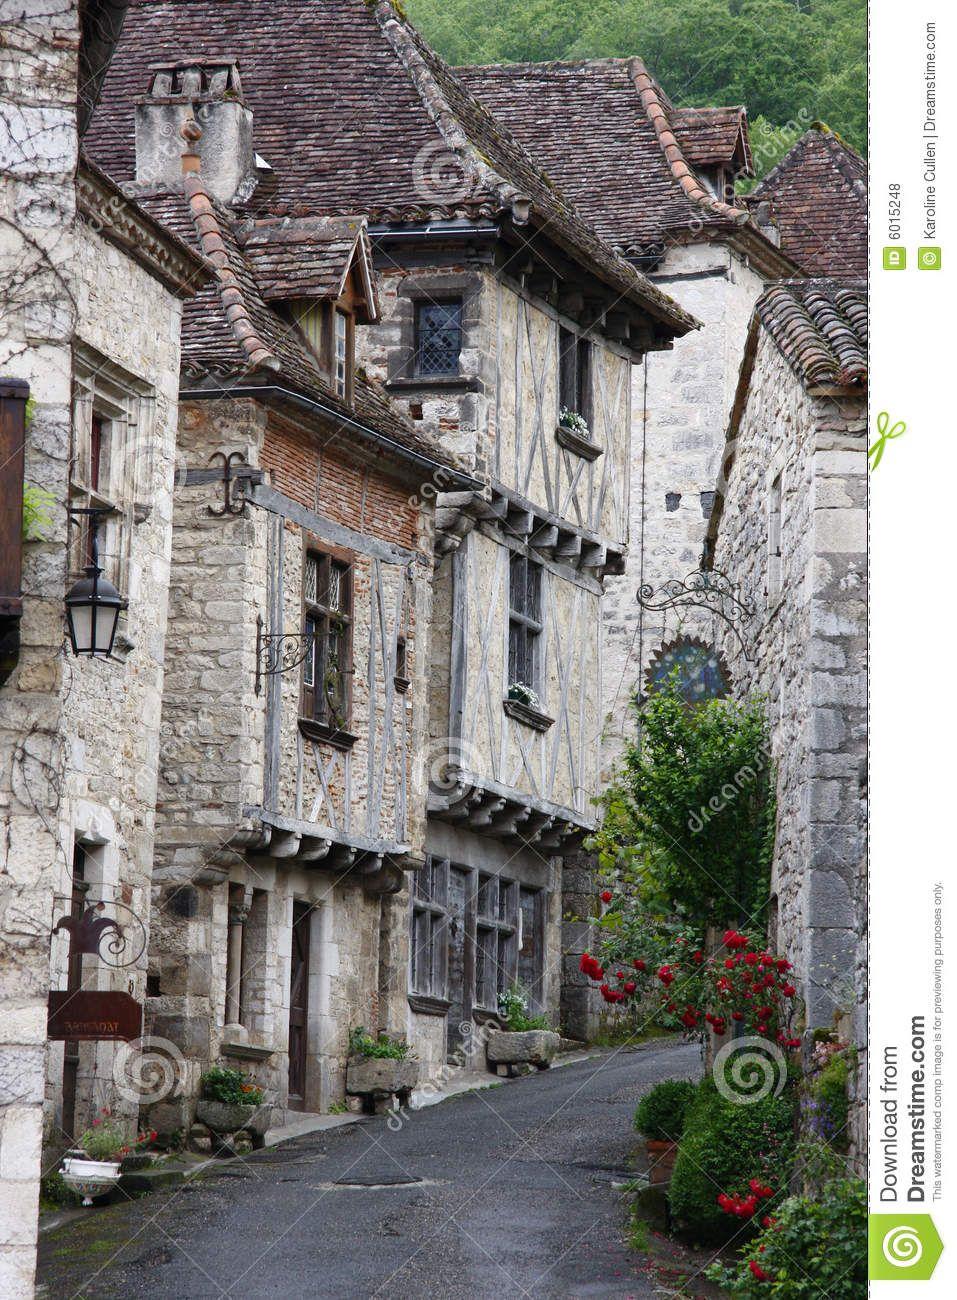 Architecte Paysagiste Midi Pyrénées french medieval street - download from over 53 million high